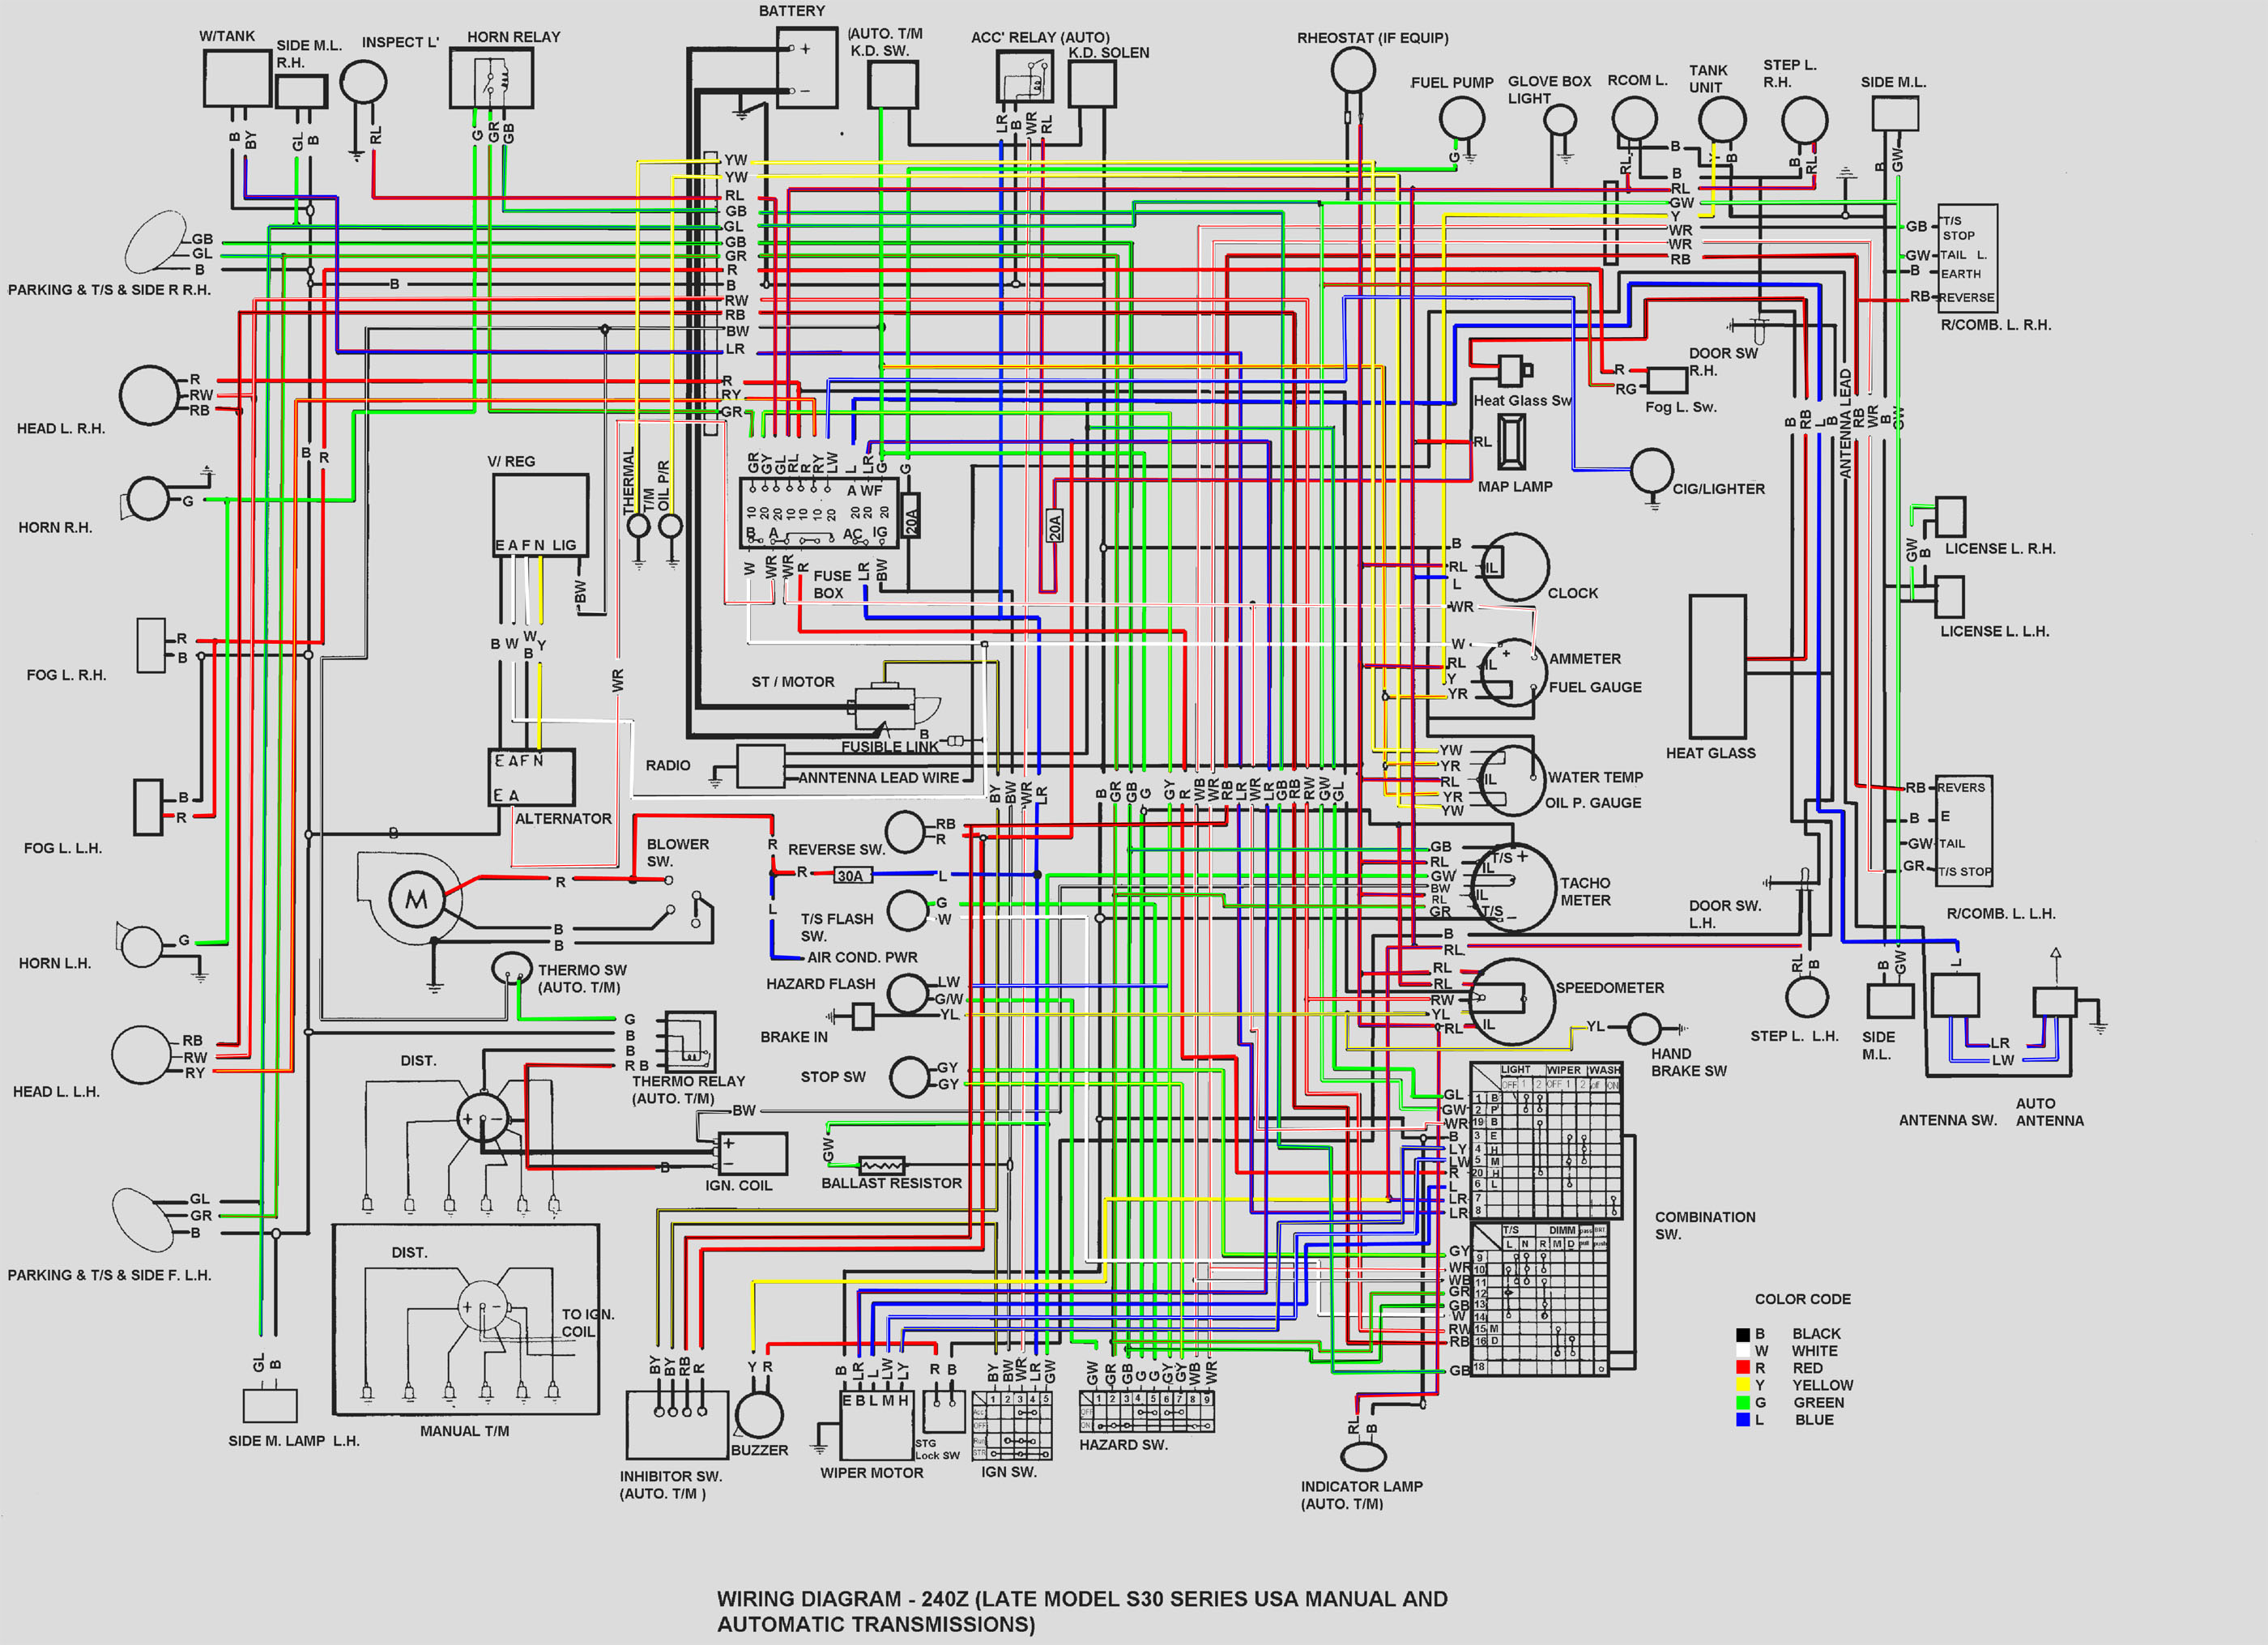 Sensational 1978 Datsun 280Z Wiring Diagram Online Wiring Diagram Wiring Cloud Rometaidewilluminateatxorg